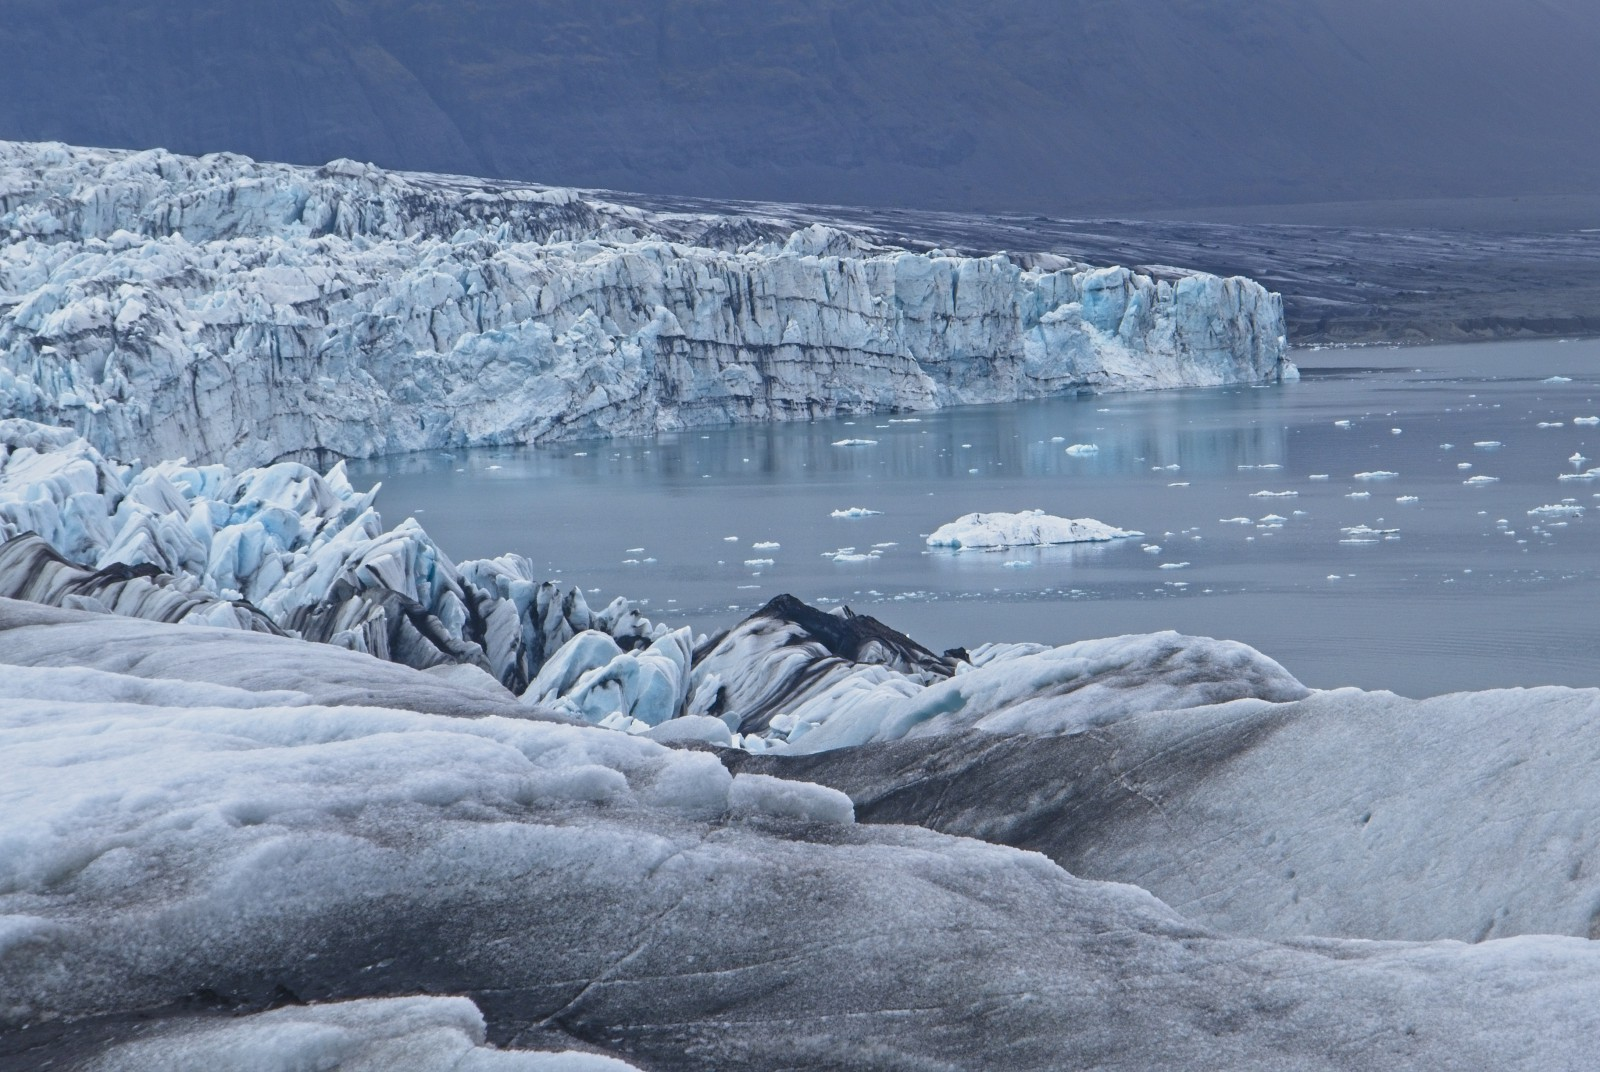 Blue Steel - Ice Calving into Jökulsárlón (Glacier Lagoon) Photo: Steinþór Birgisson